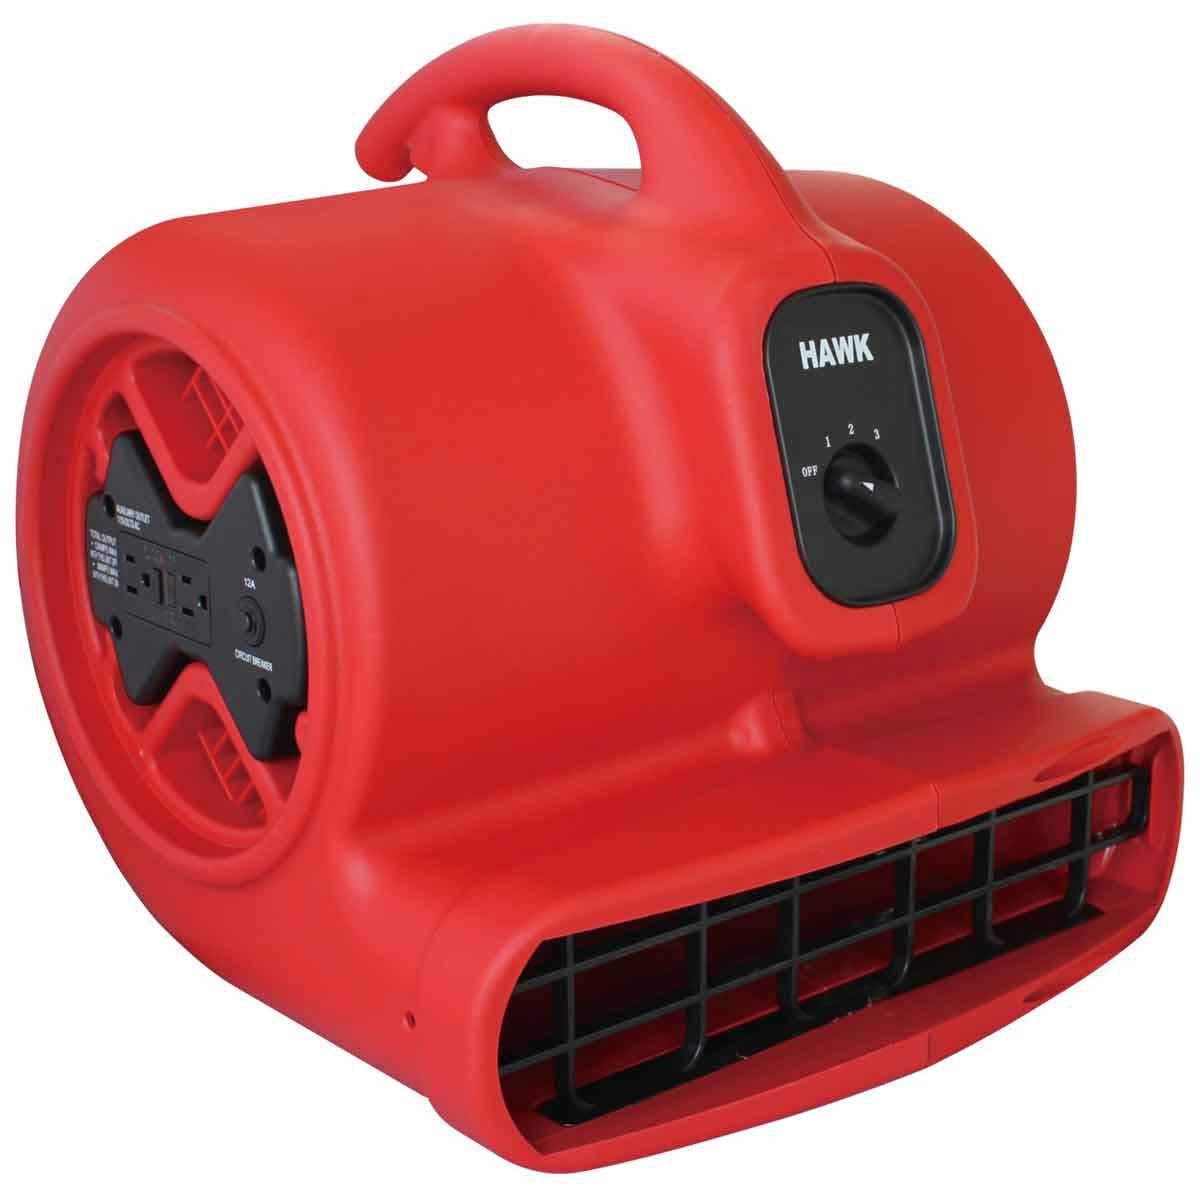 Hawk Air Mover ventilator stack